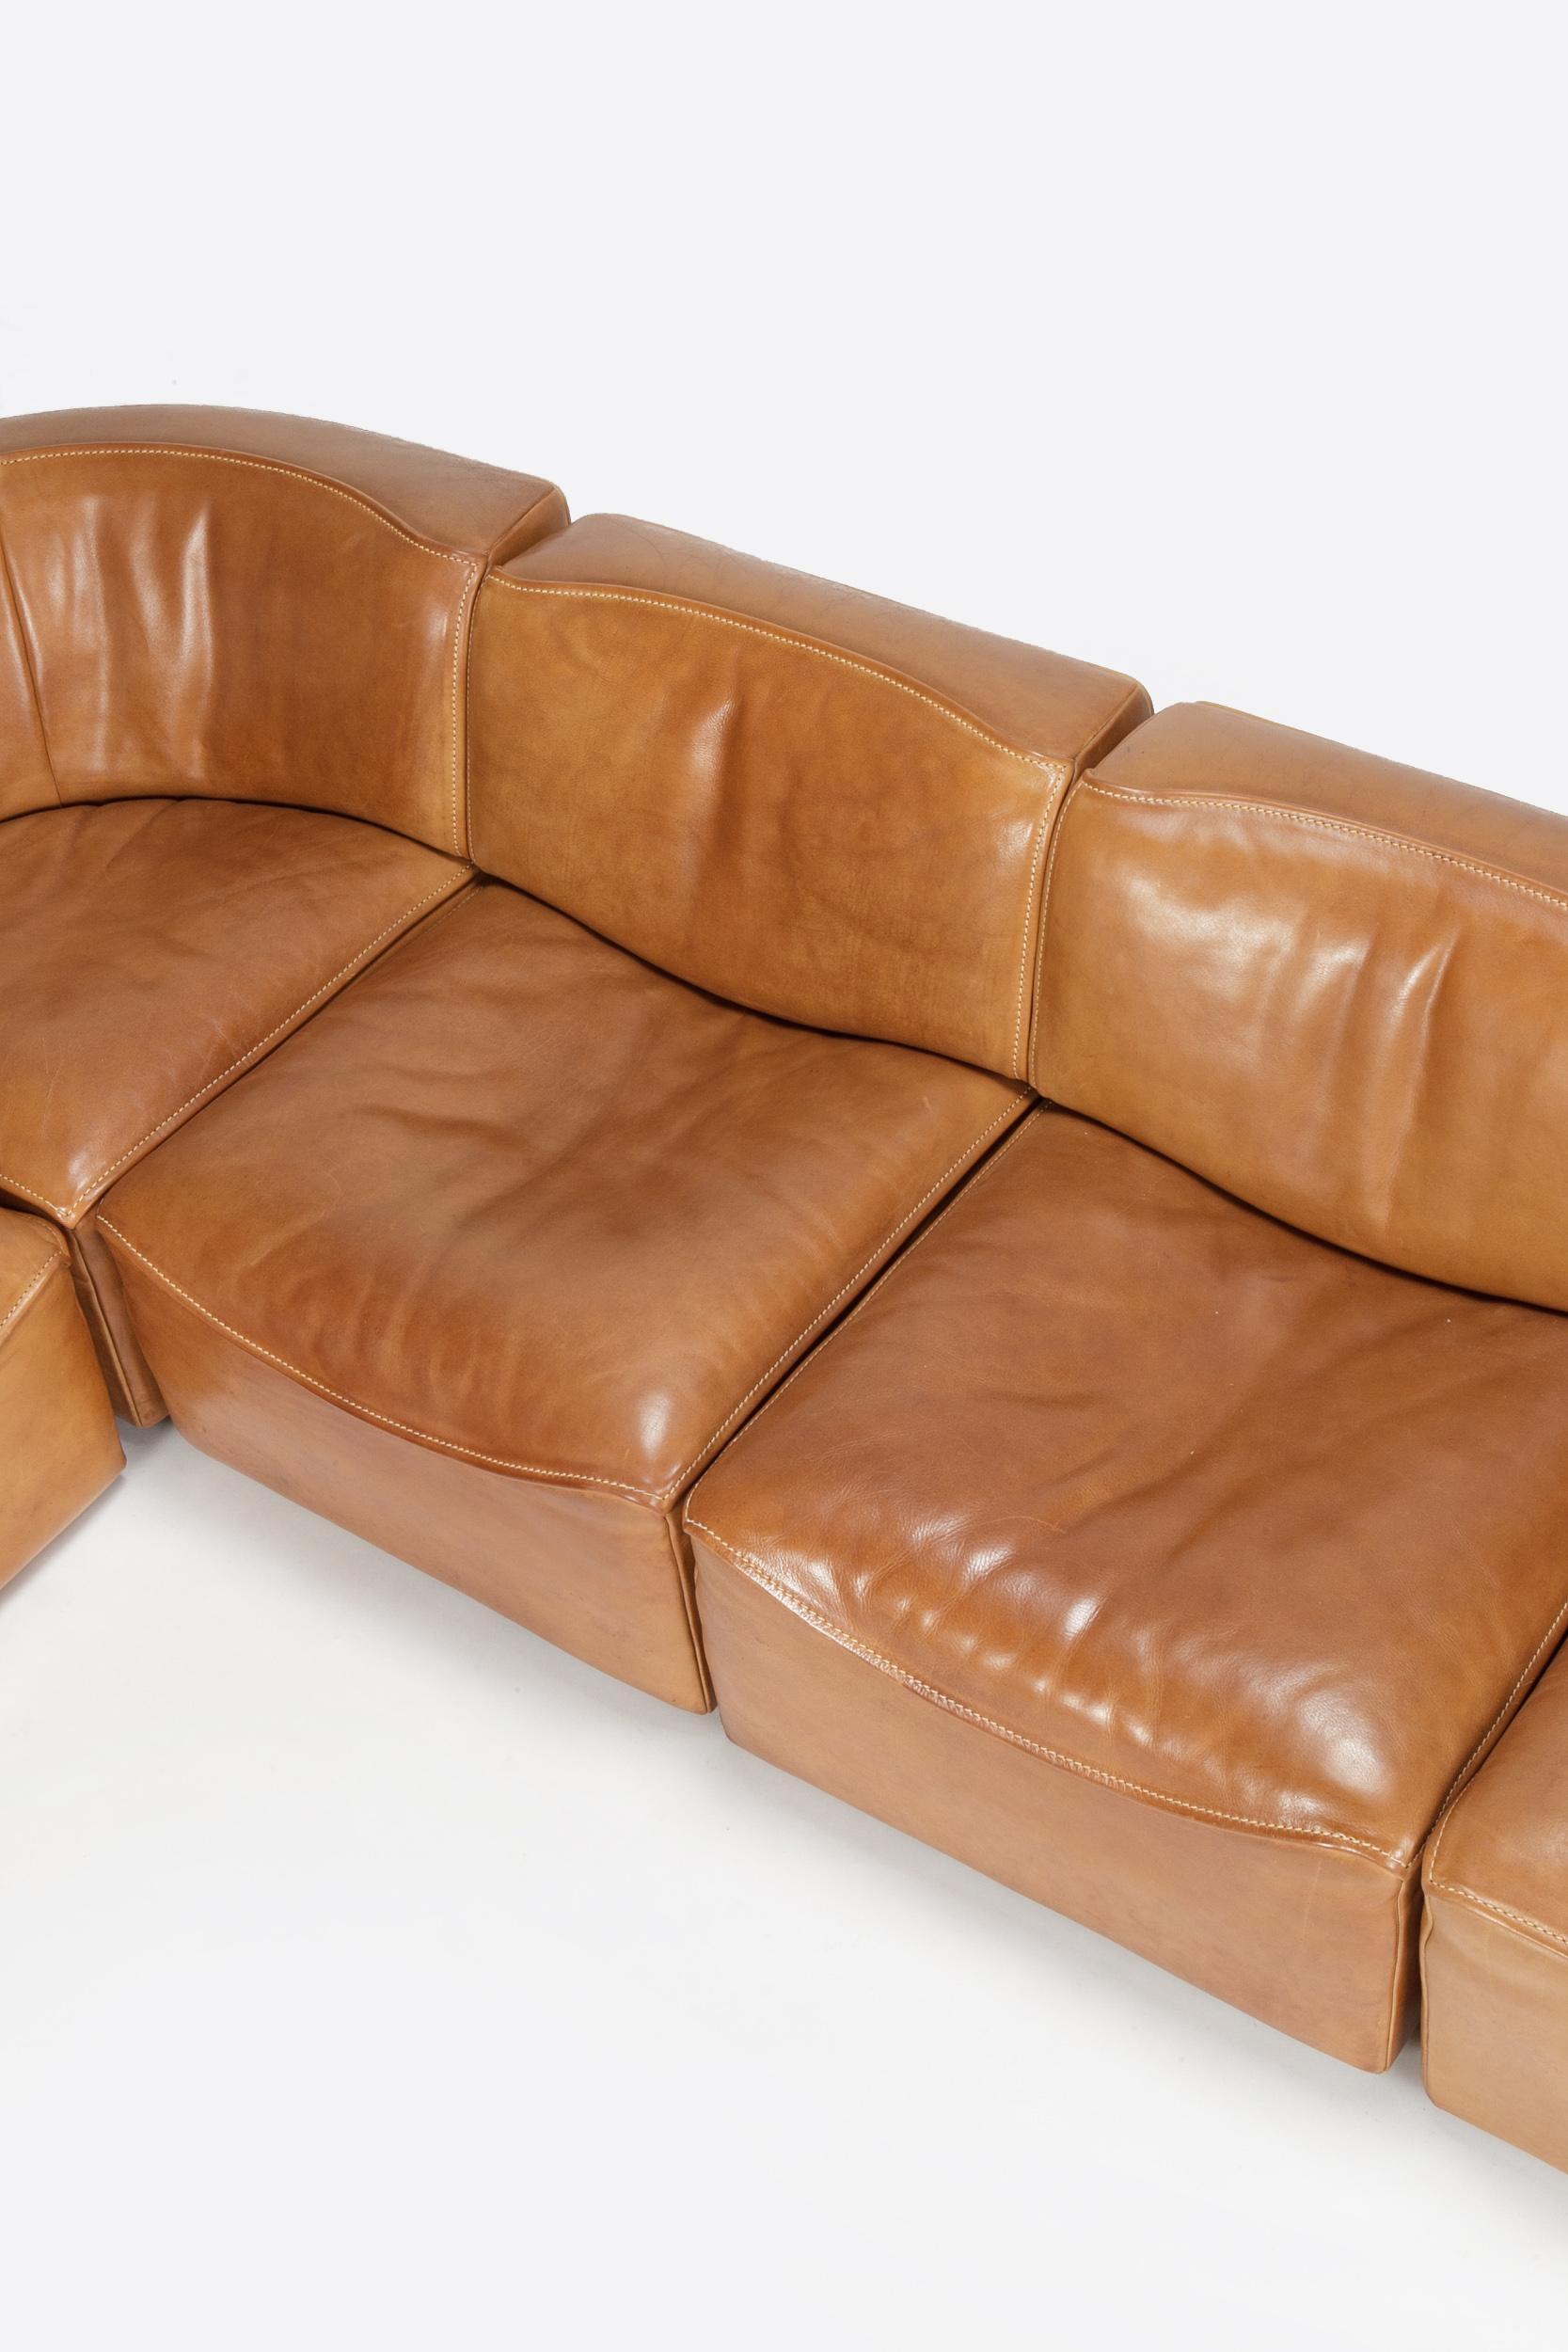 swiss de sede modular sofa ds 15 1970 from okay art on rubylux. Black Bedroom Furniture Sets. Home Design Ideas